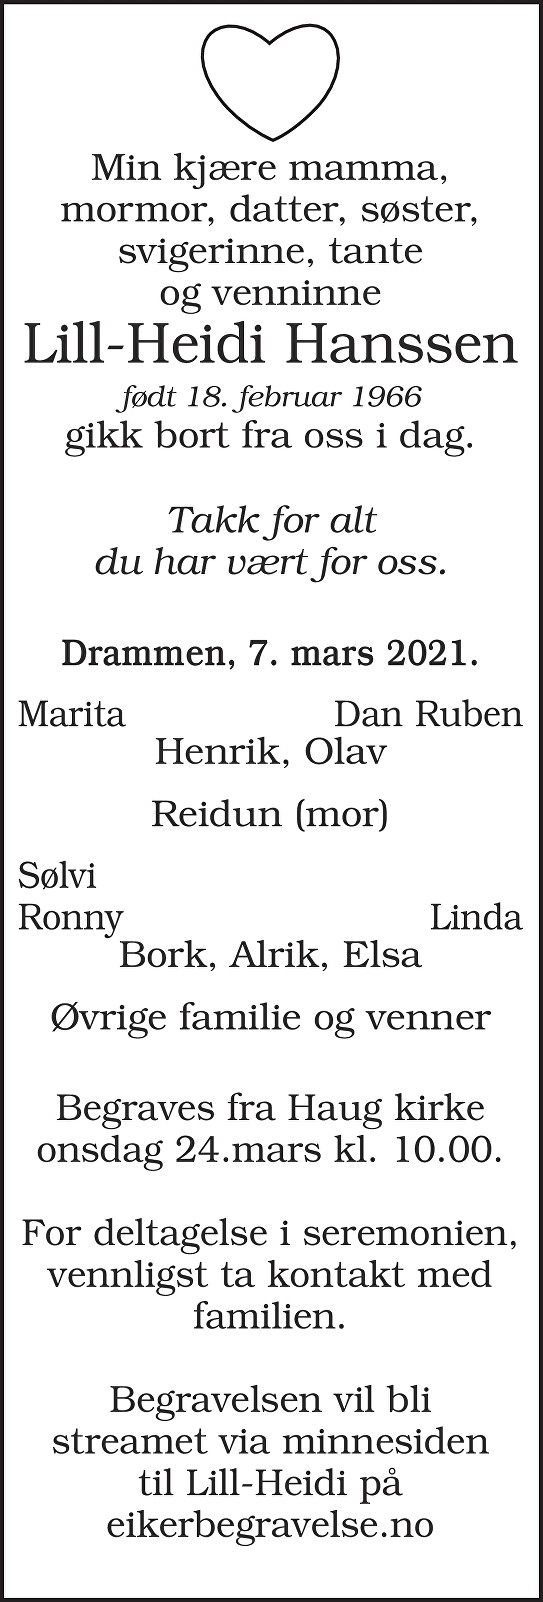 Lill-Heidi Hanssen Dødsannonse